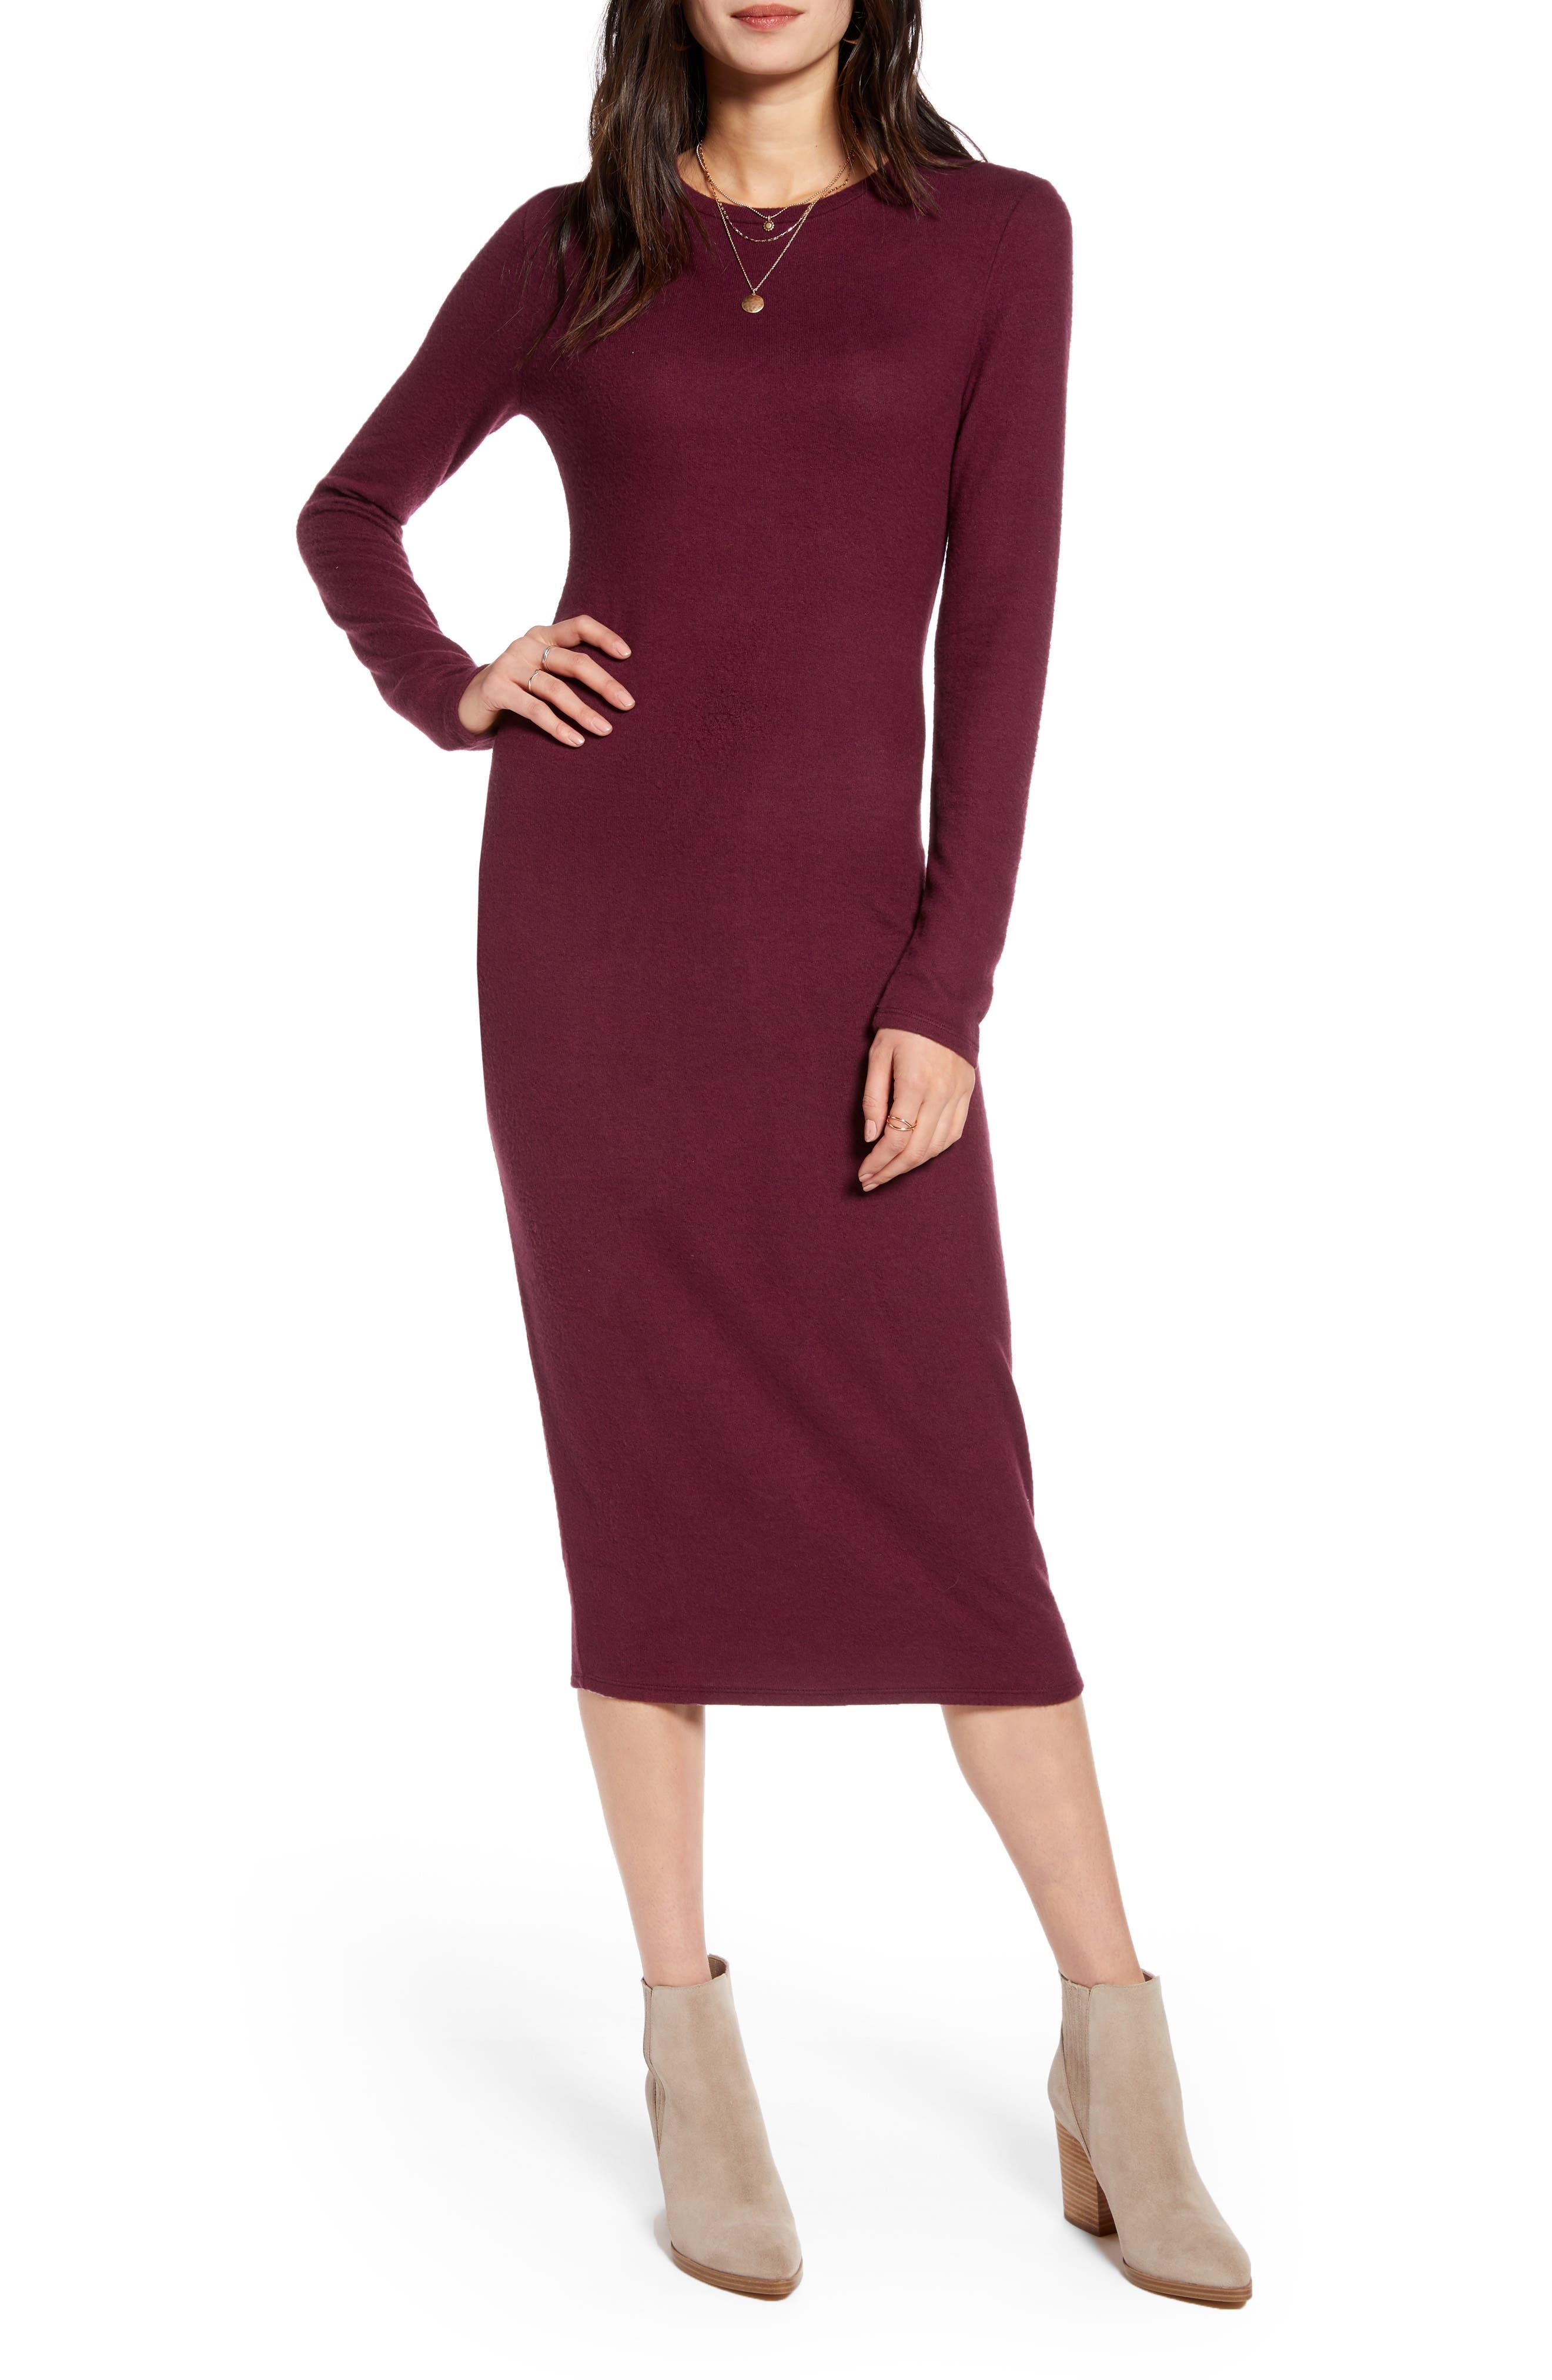 Treasure & Bond Cozy Long Sleeve Sweater Dress